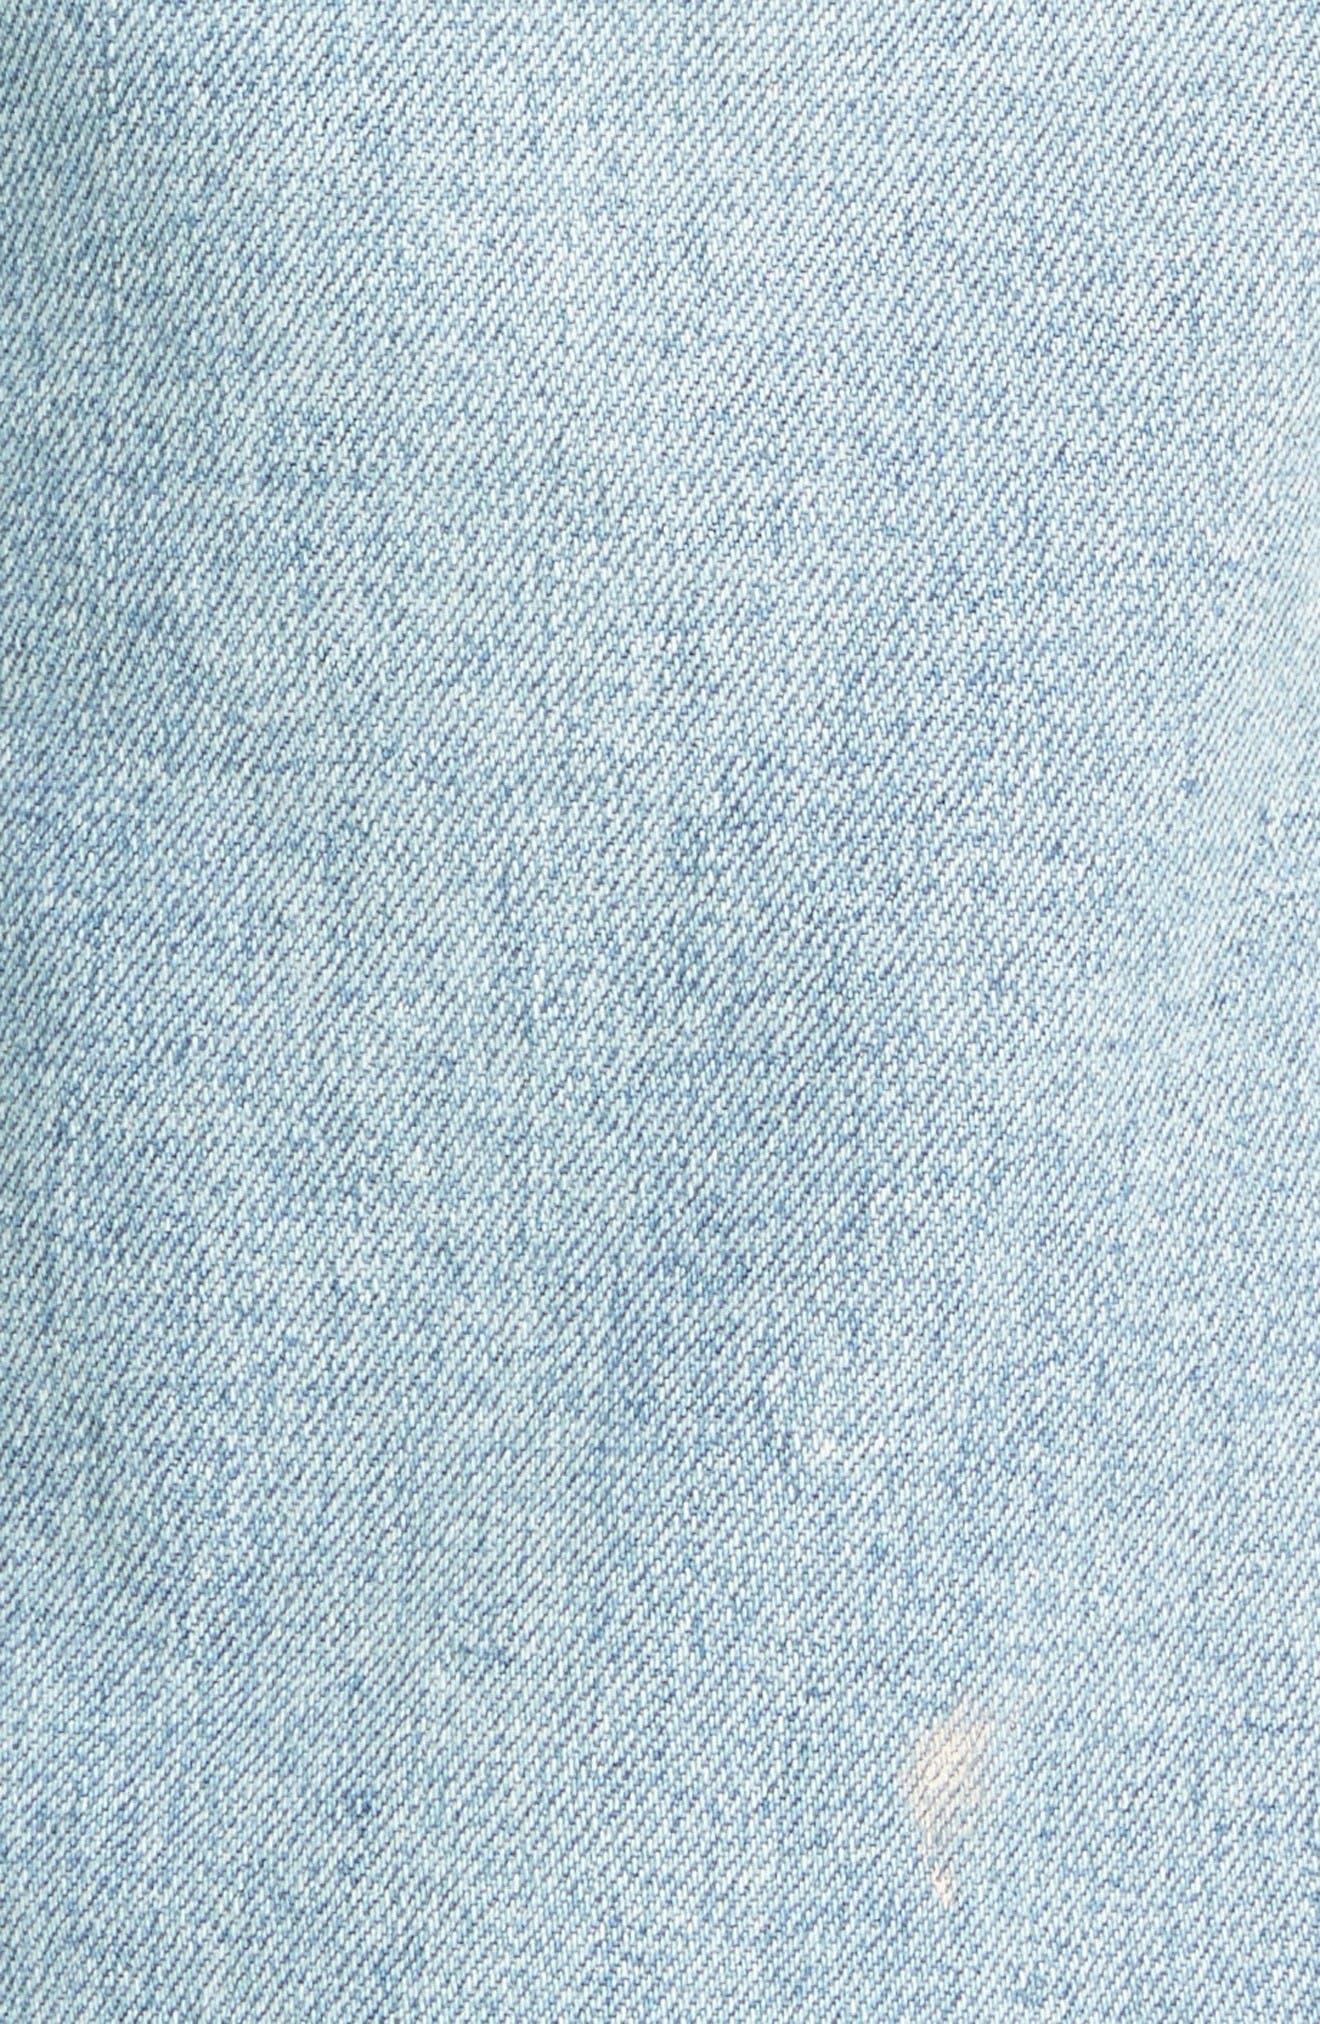 Alternate Image 6  - La Vie Rebecca Taylor Paint Splatter Straight Leg Jeans